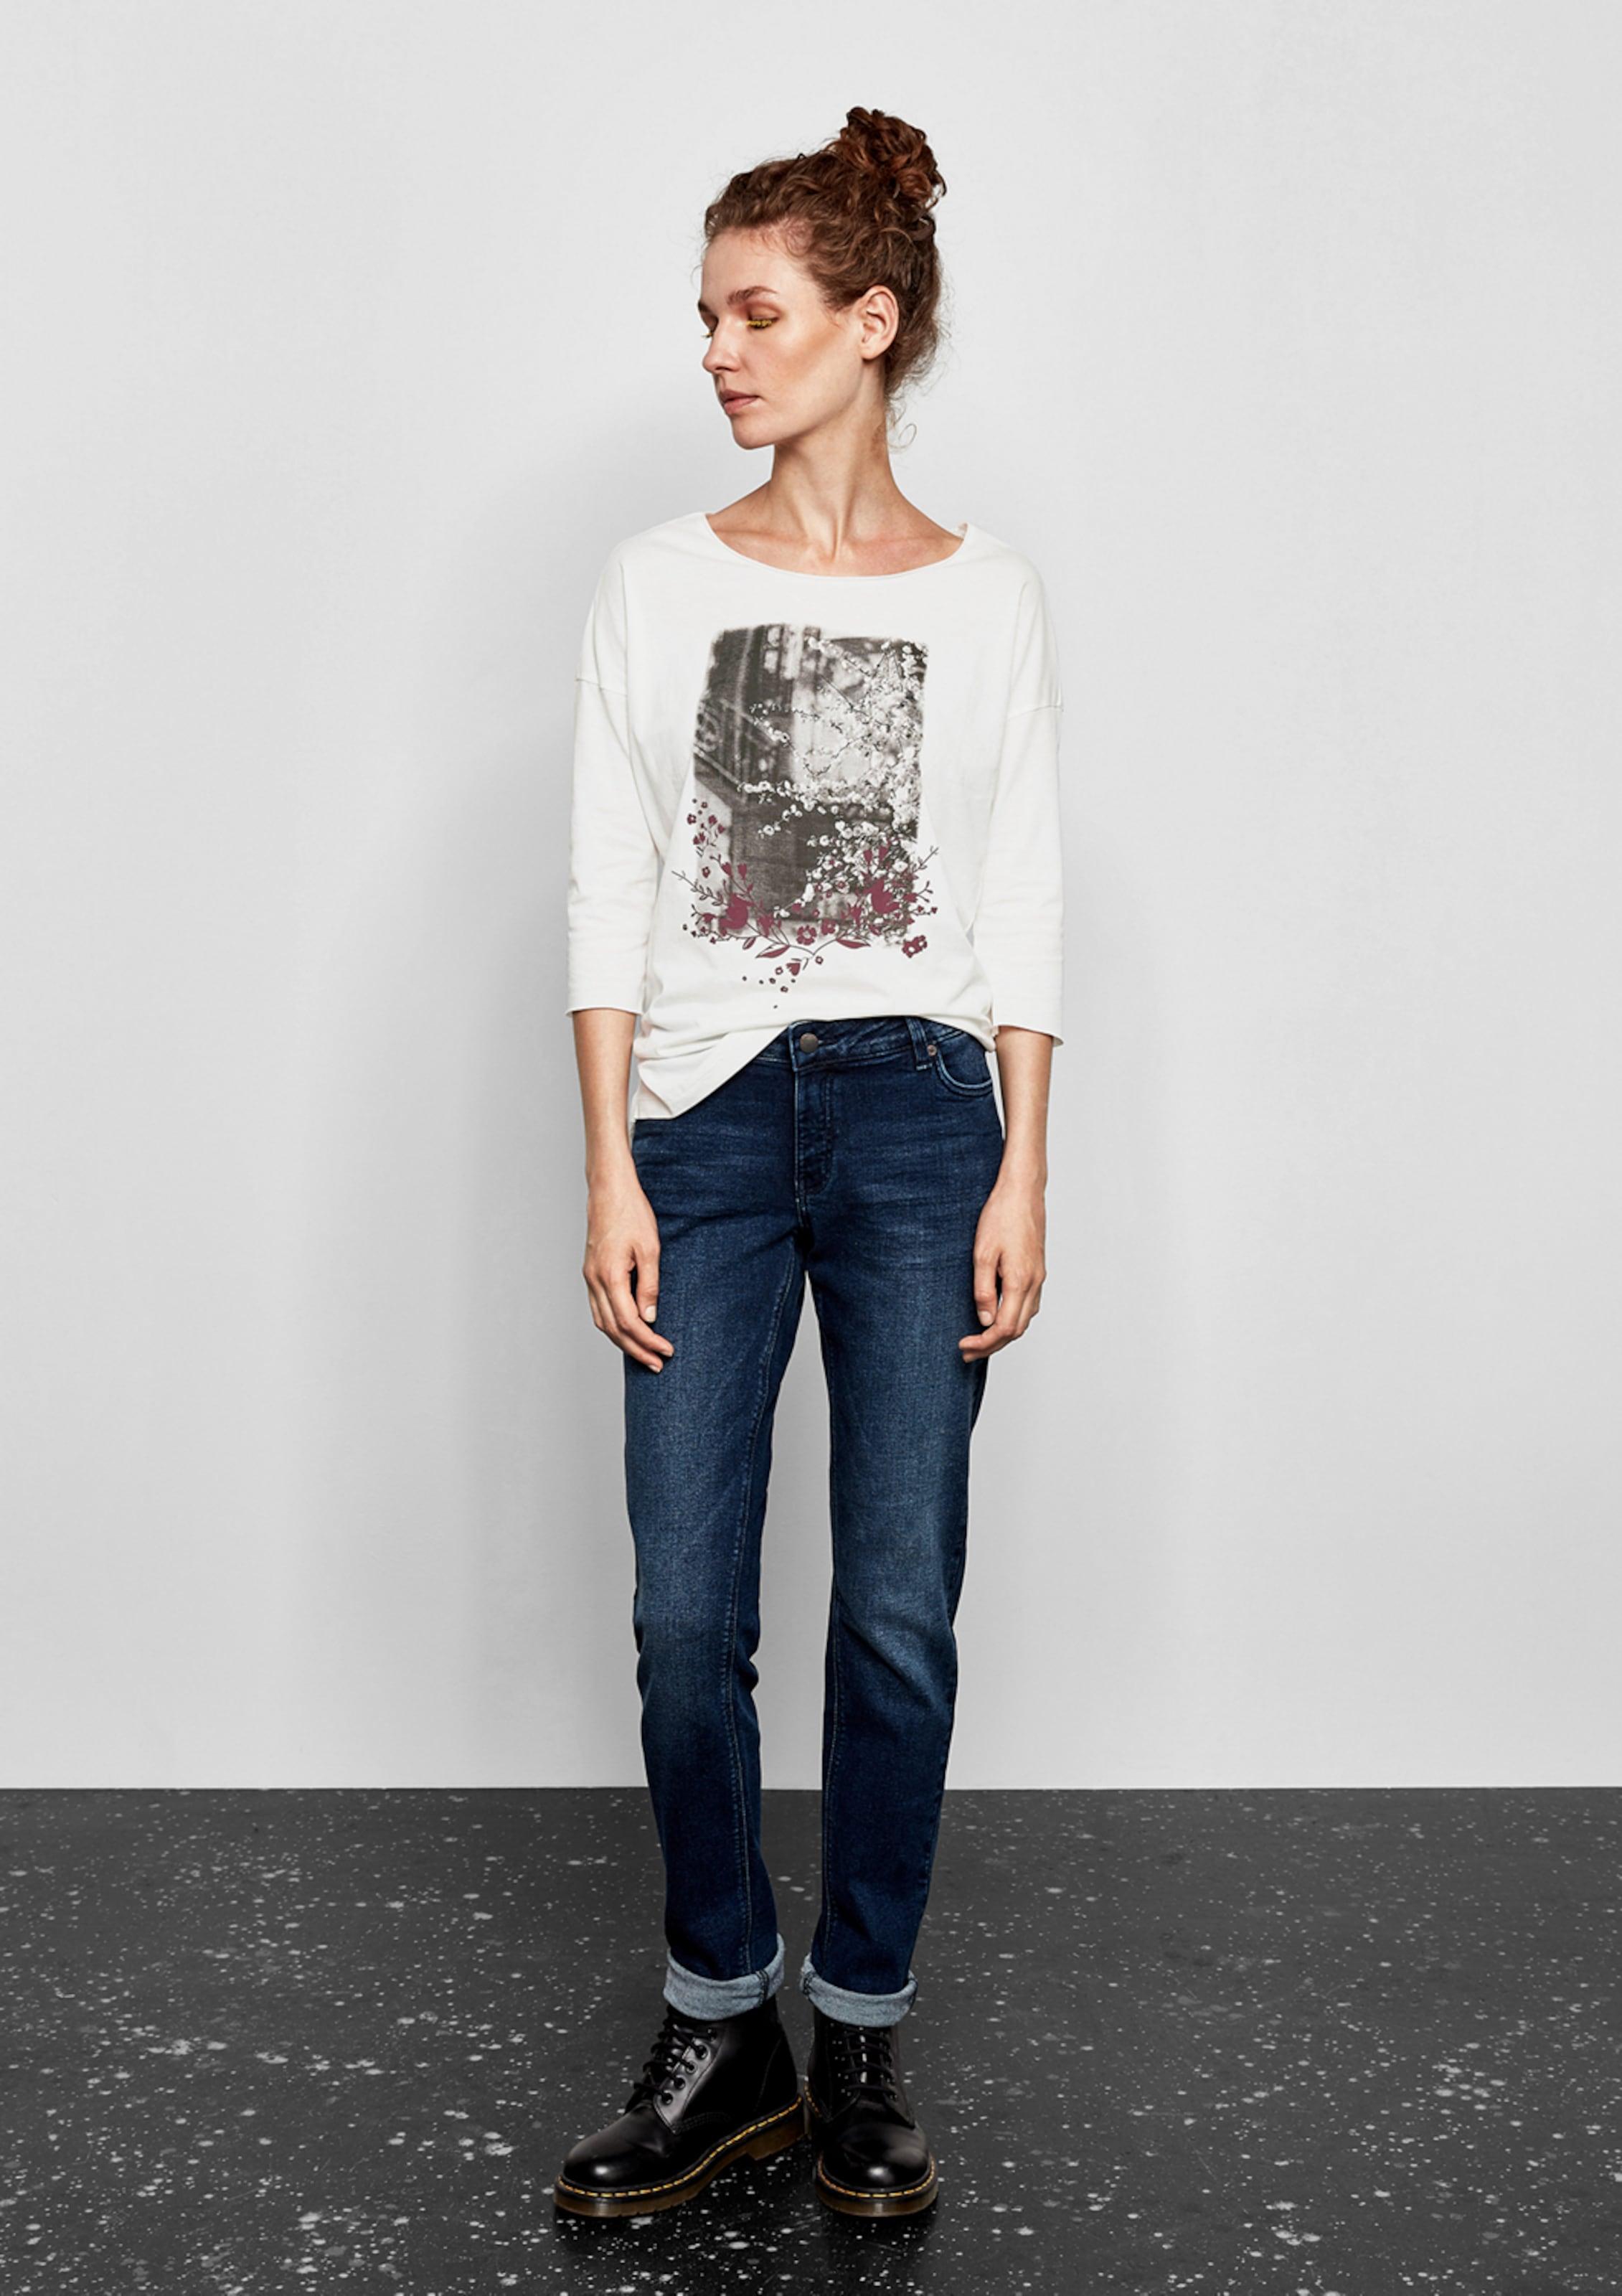 Designed Weiß s By In Shirt Q N8wmn0